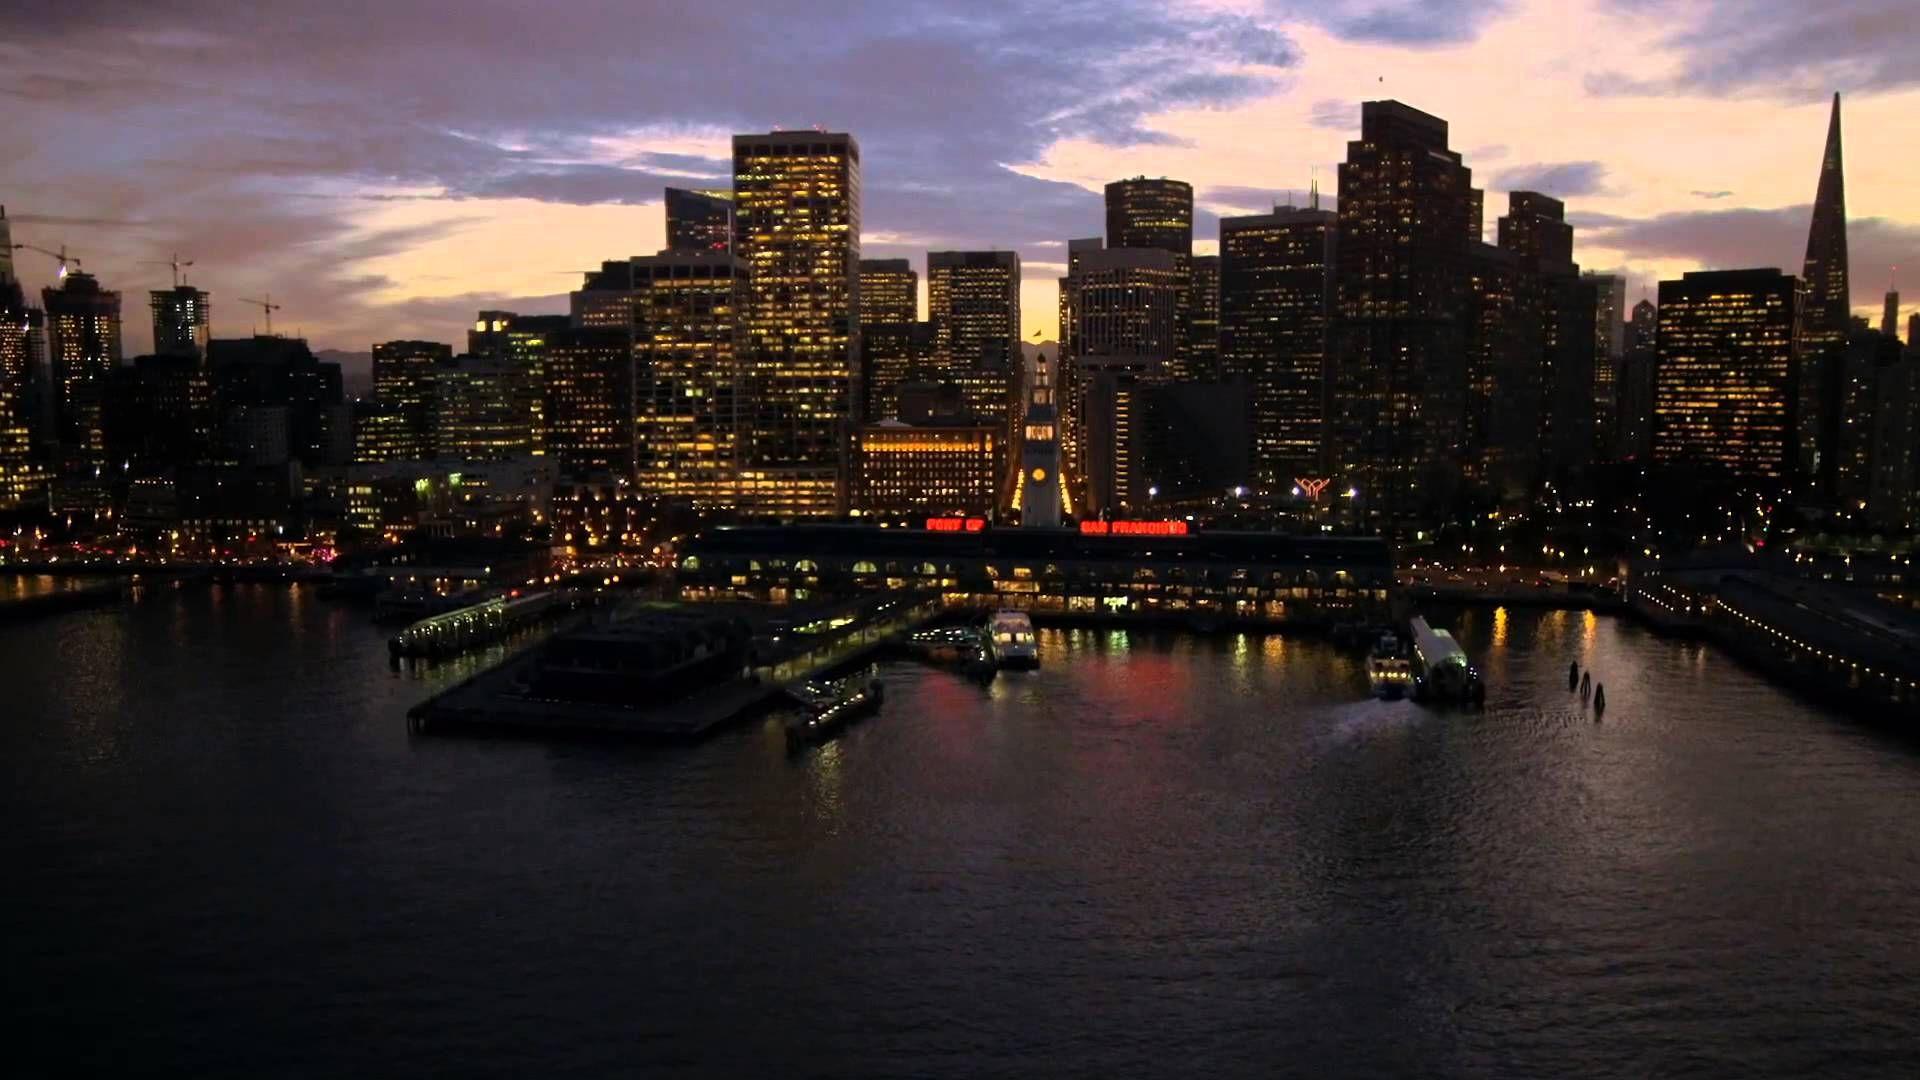 Apple Tv 4 Aerial Screensaver Port Of San Francisco Night Download San Francisco At Night San Francisco Port